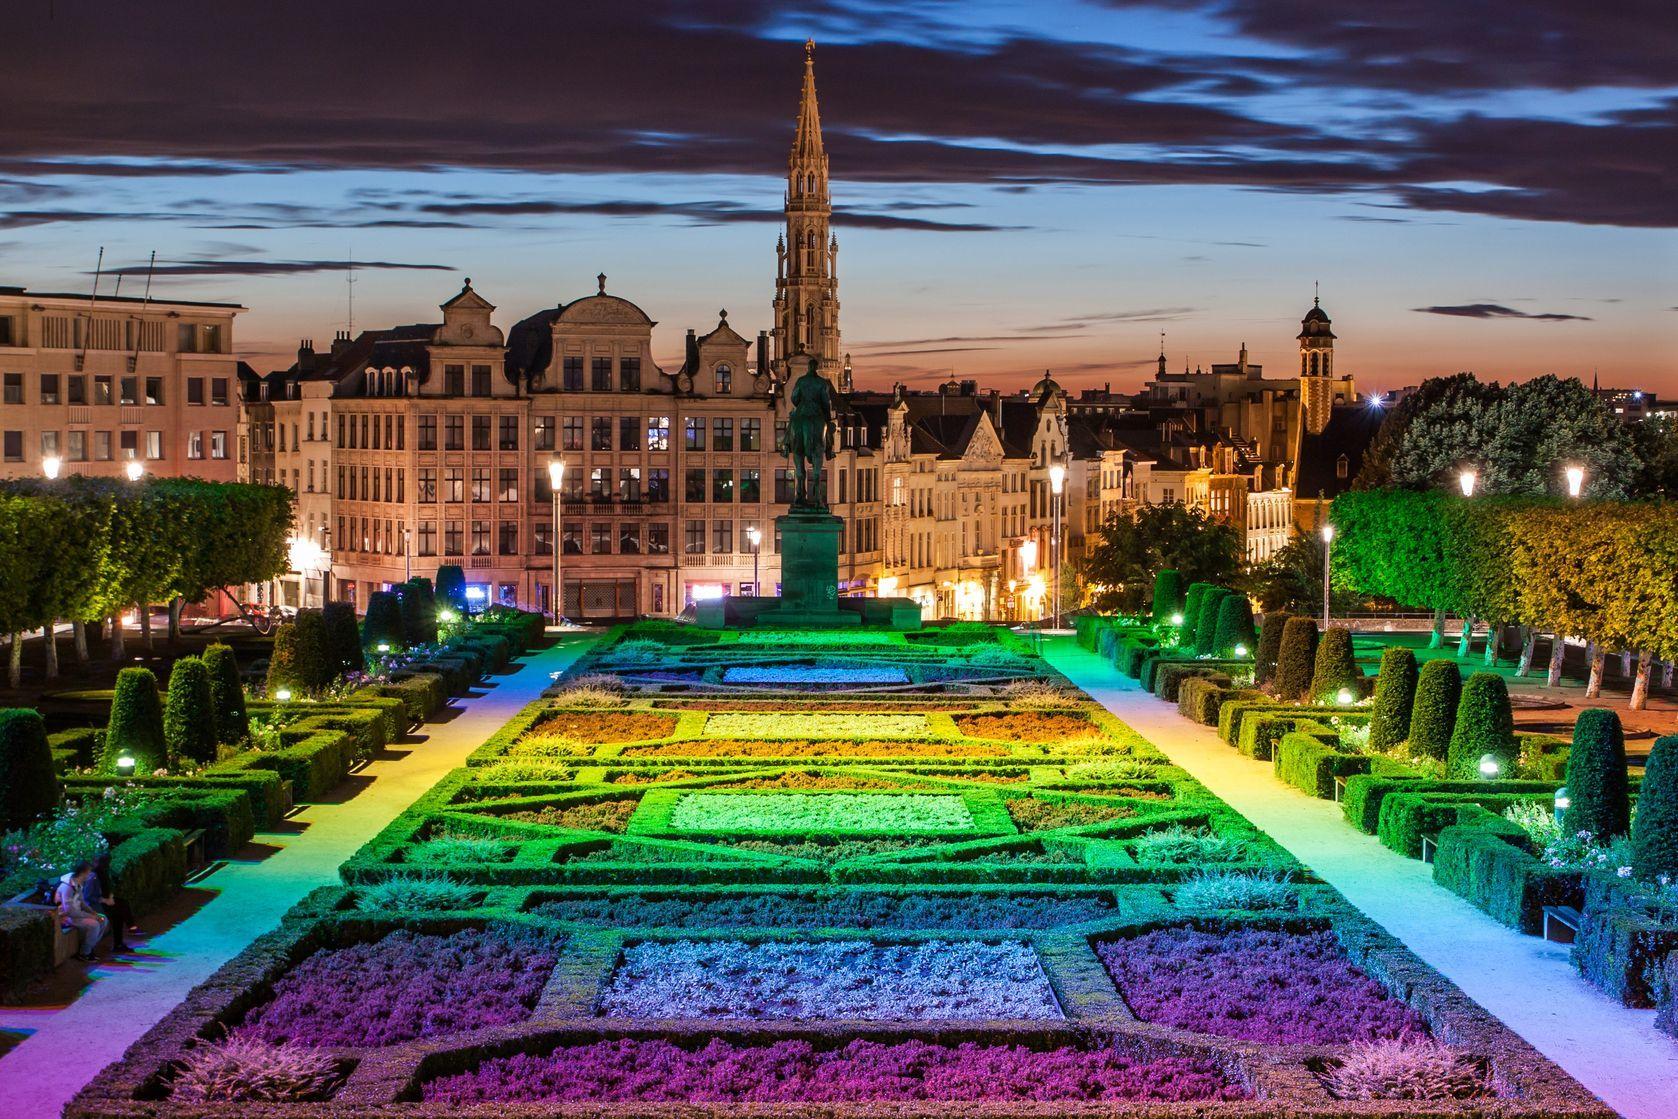 Panorama města z Bruselu od Monts des Arts   bukki88/123RF.com